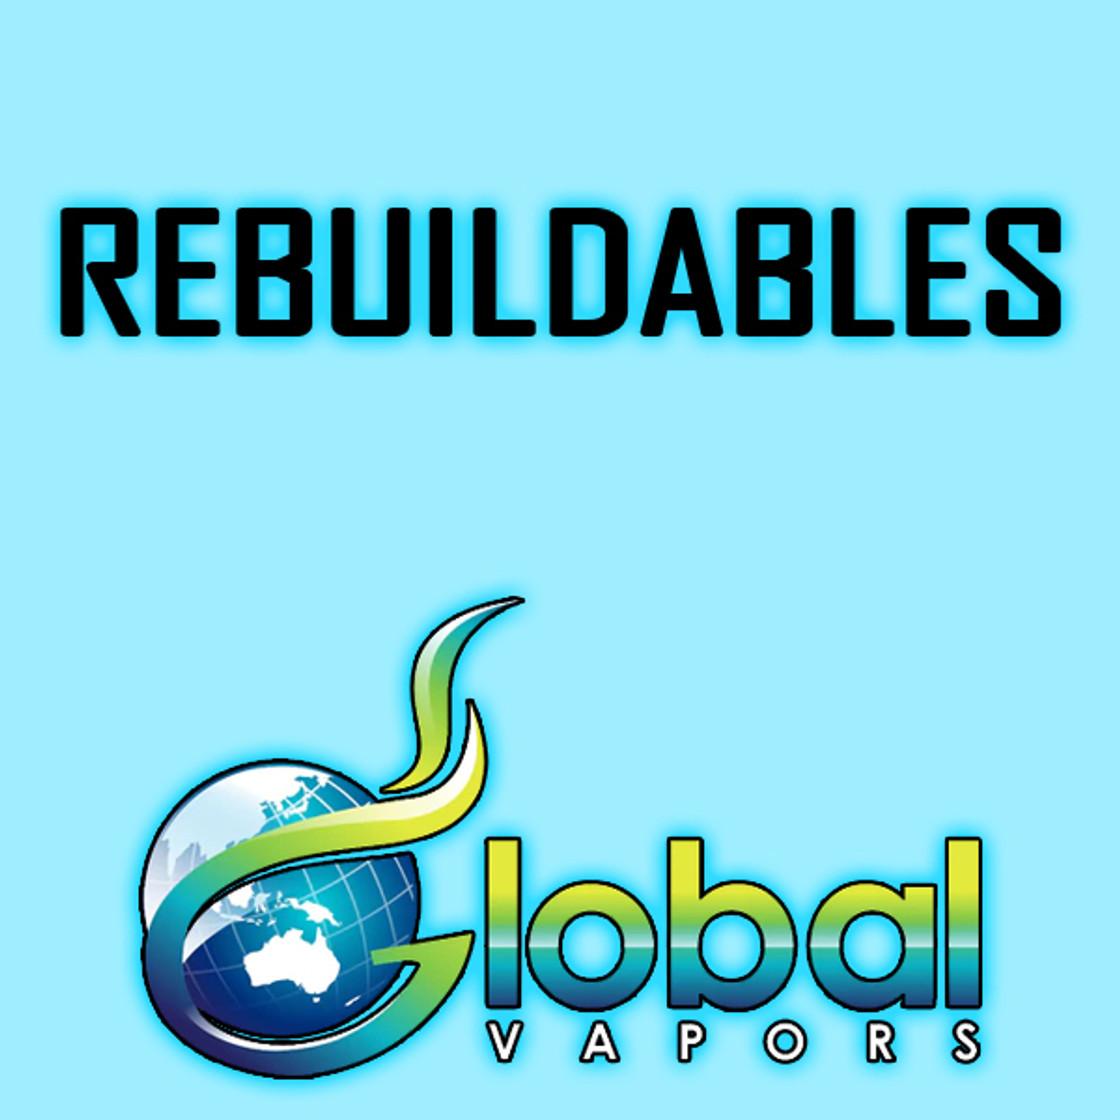 Rebuildables